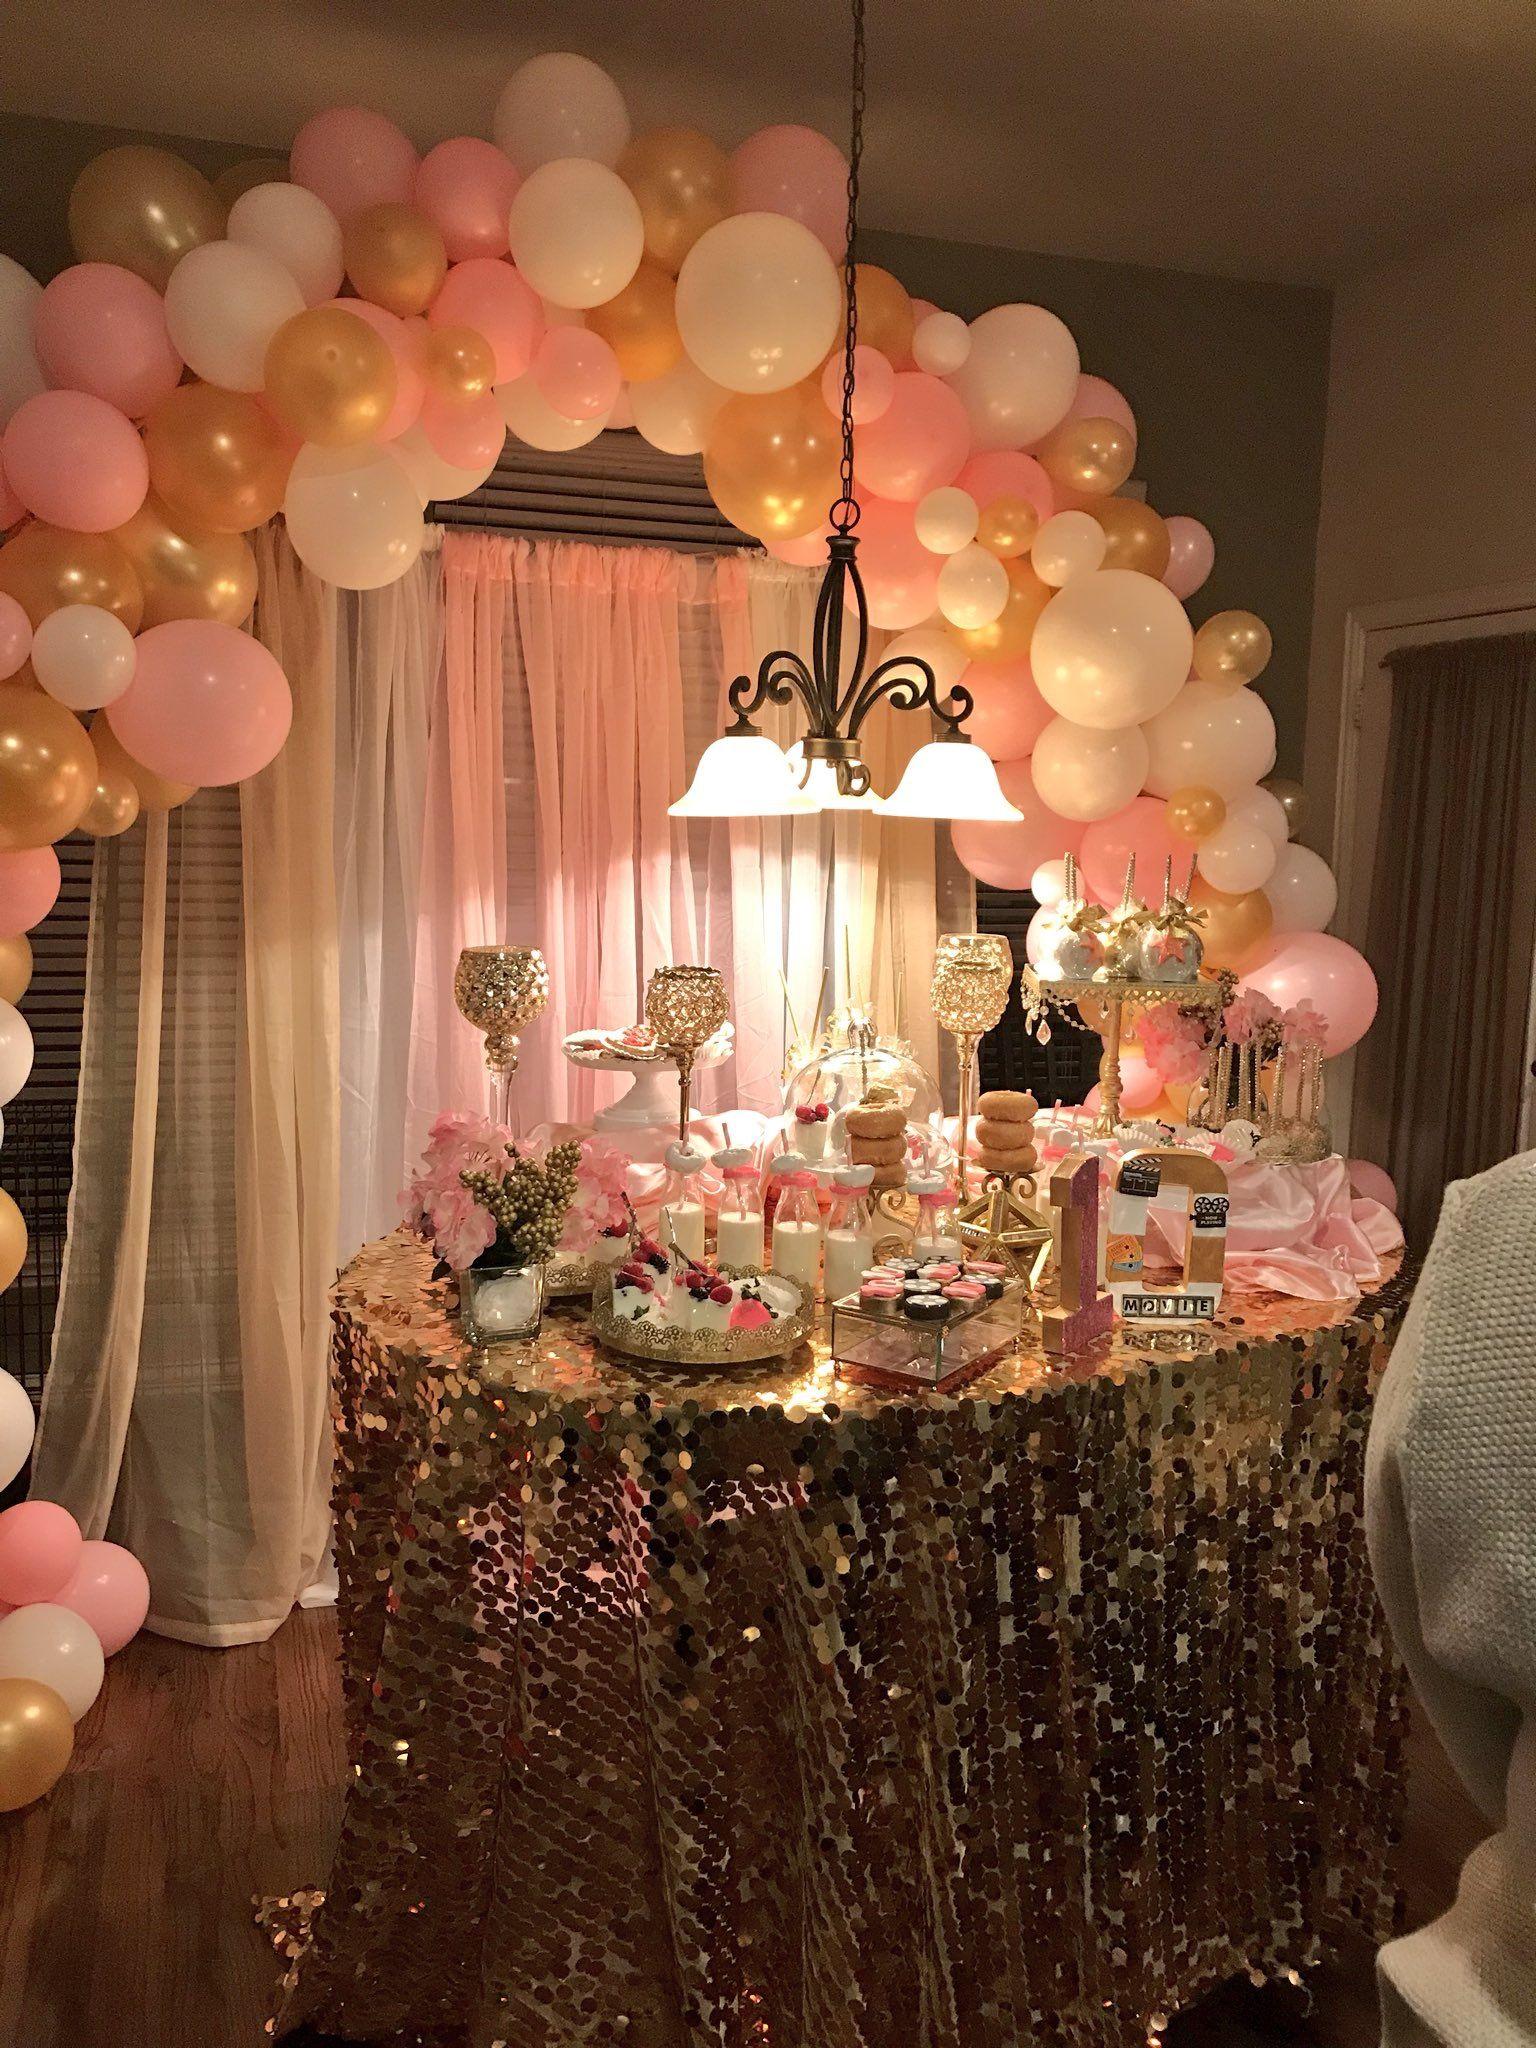 Girl Birthday Party 23rd Birthday Decorations Golden Birthday Parties Hotel Birthday Parties